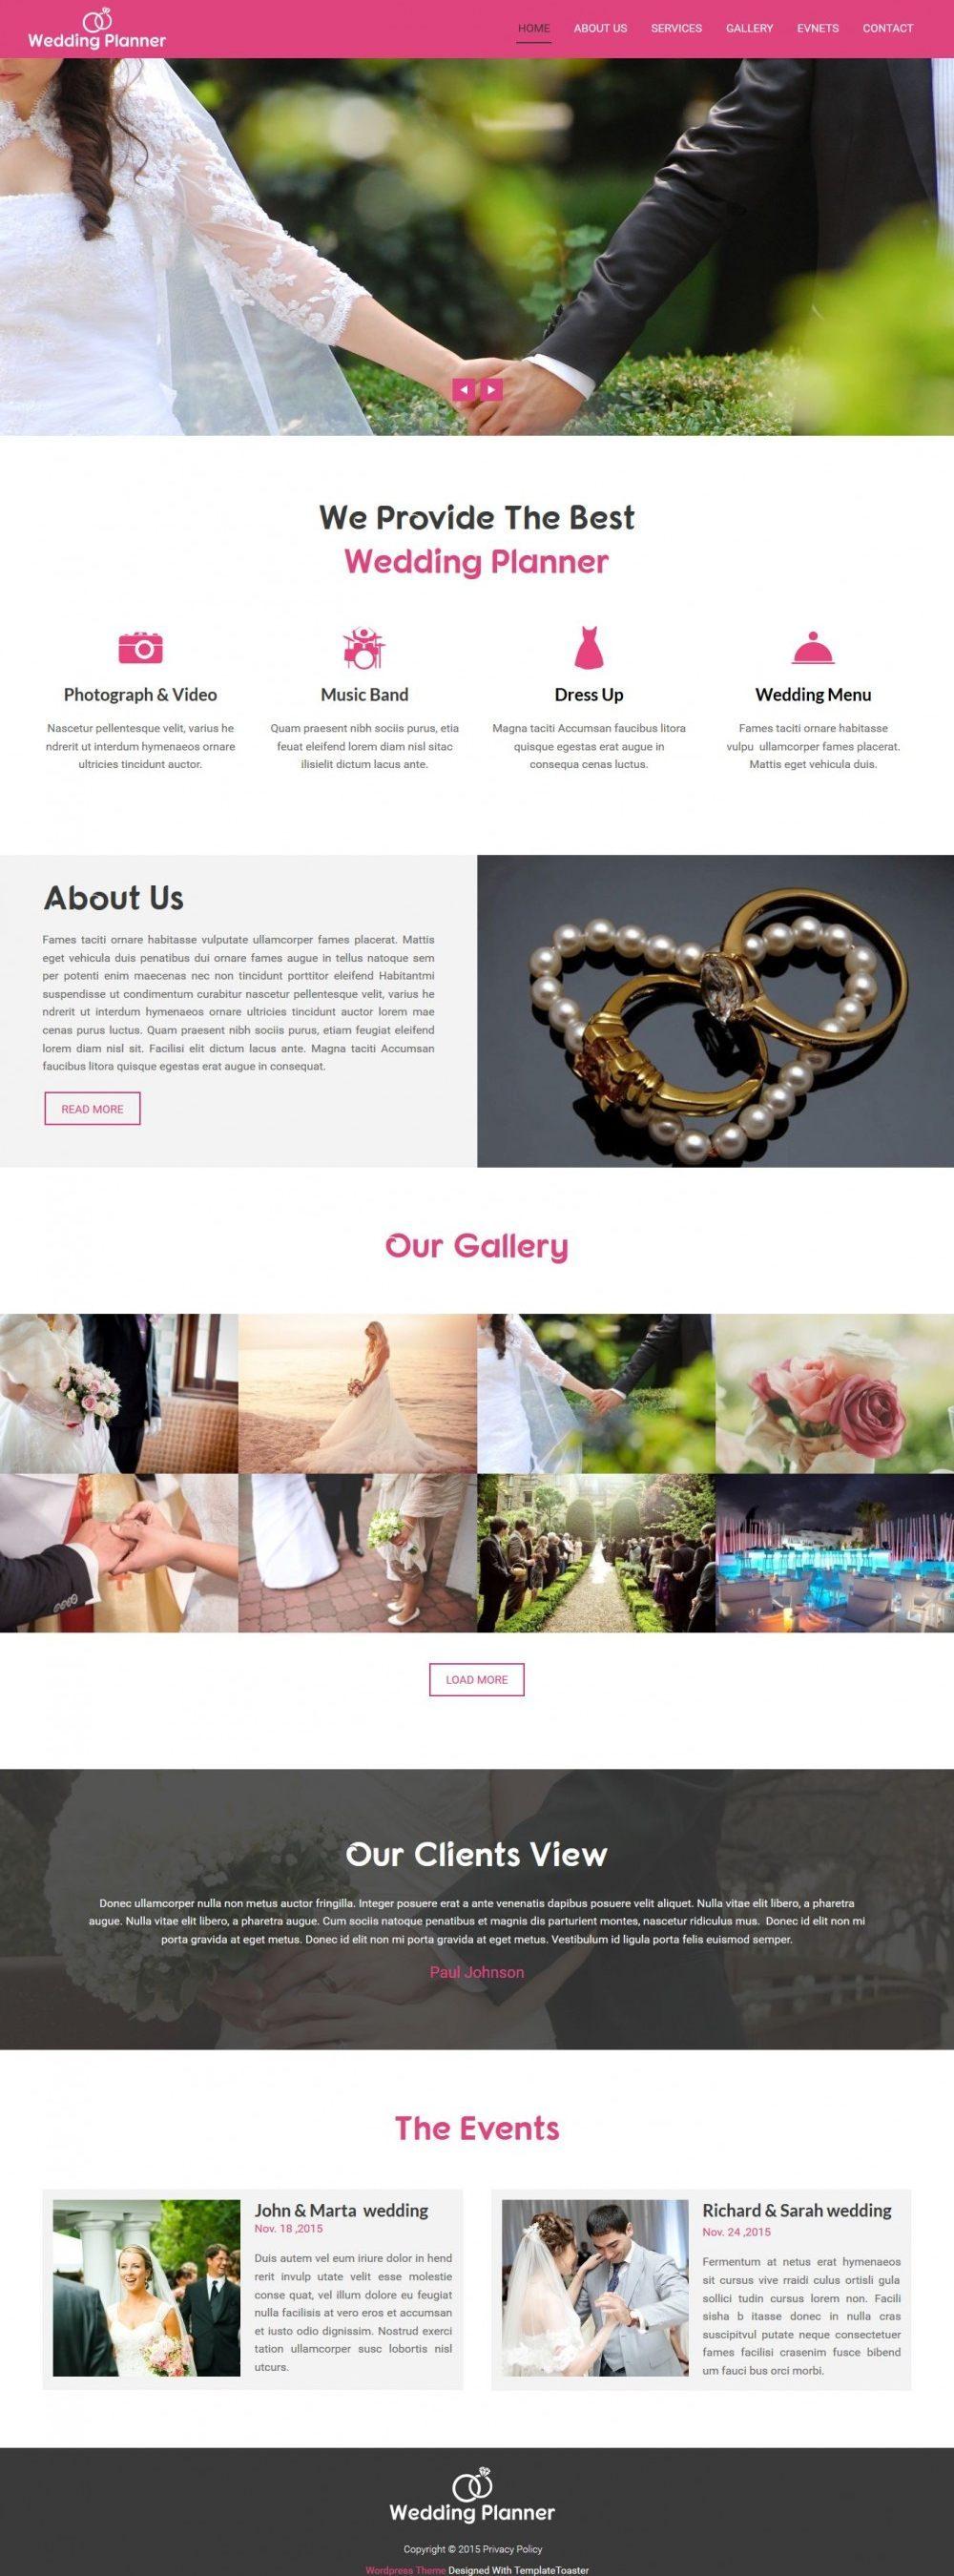 wedding planner for joomla template